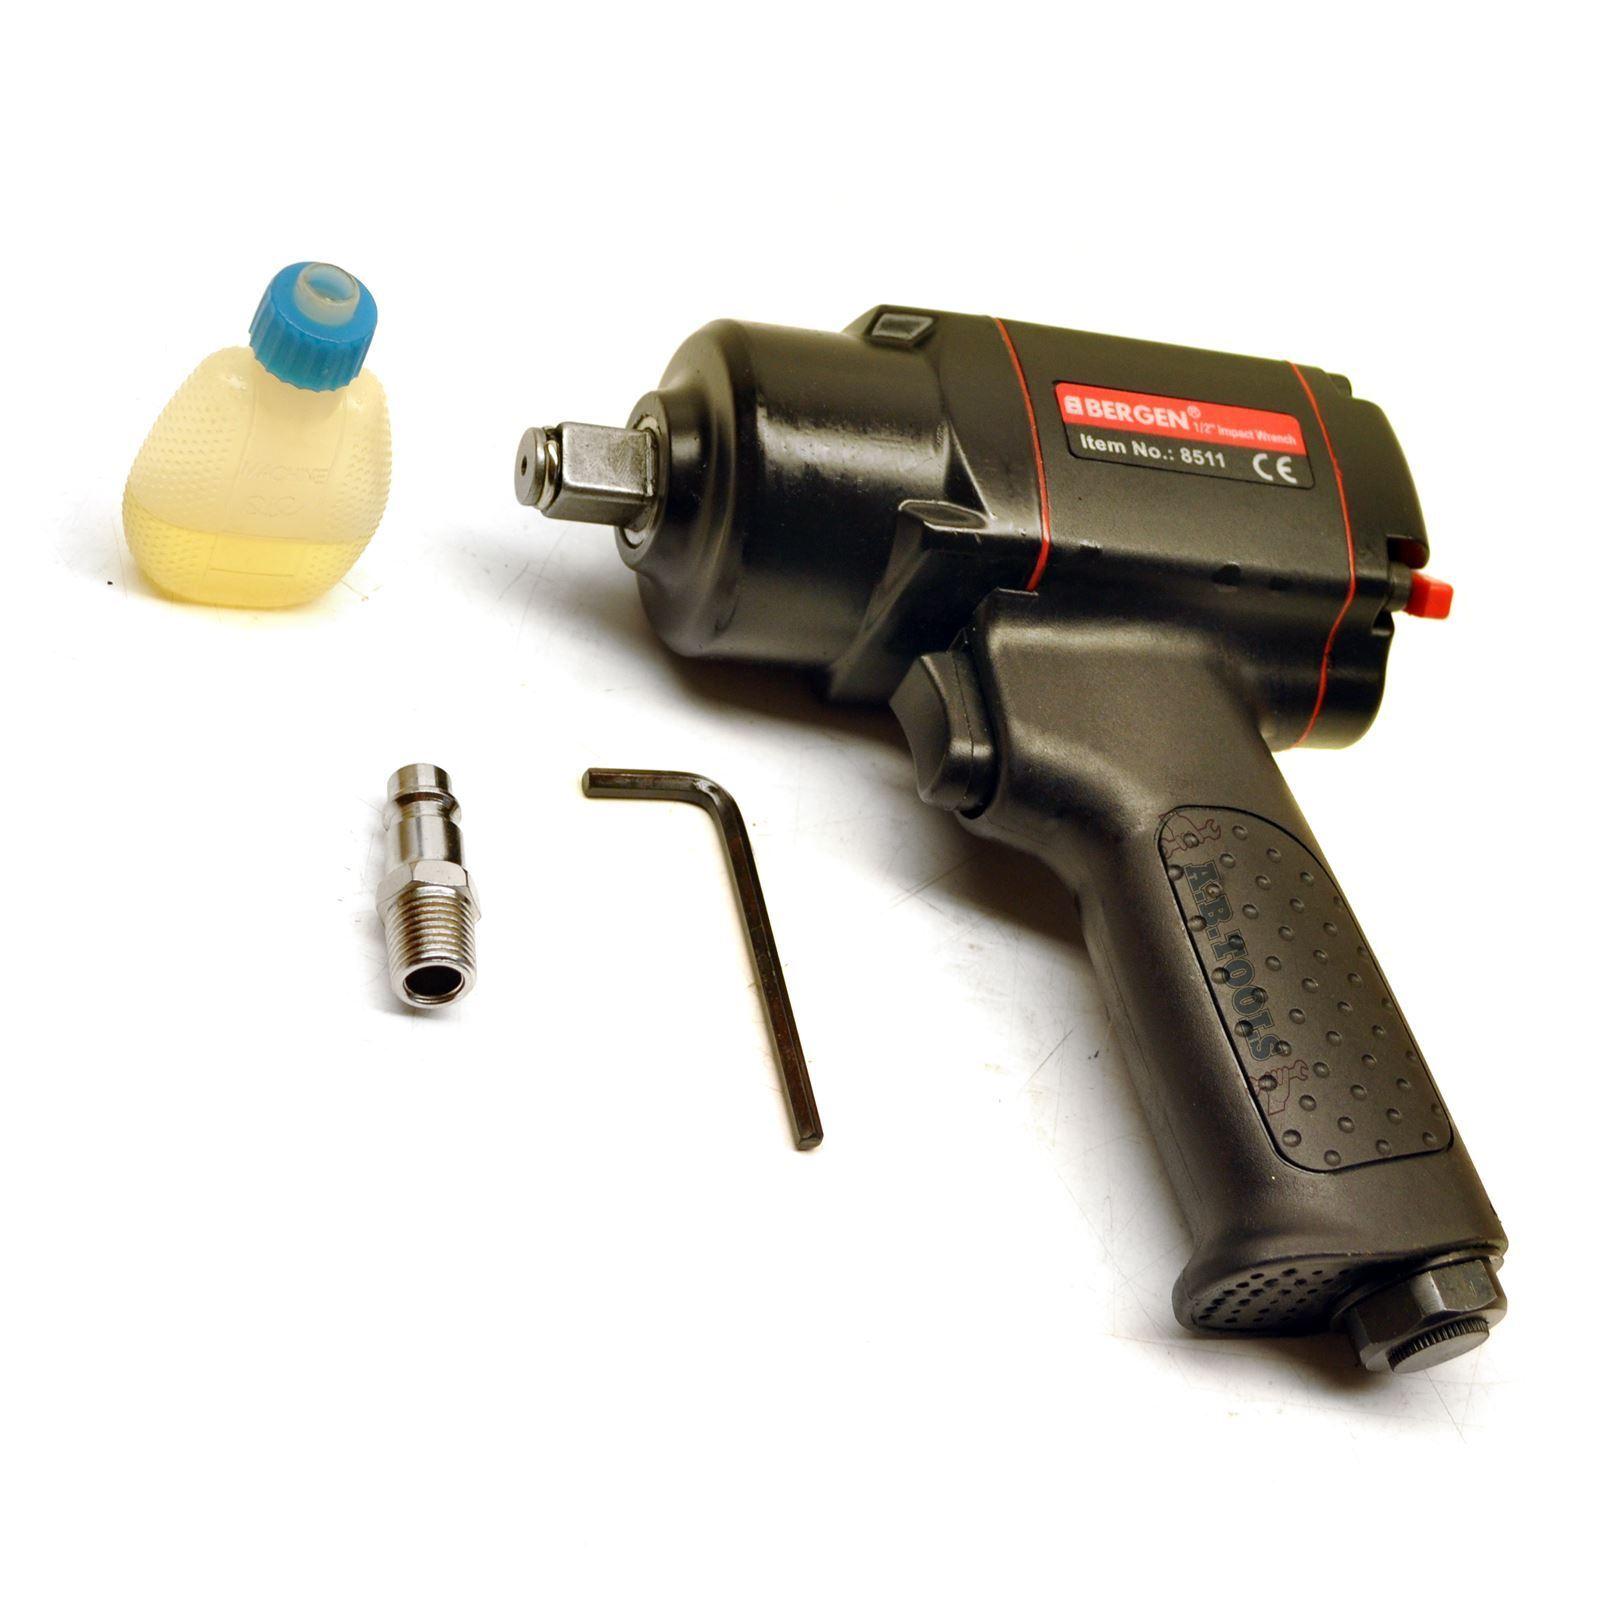 1 2  drive air impact wrench   gun mini 280 ft lbs  380Nm BERGEN AT803